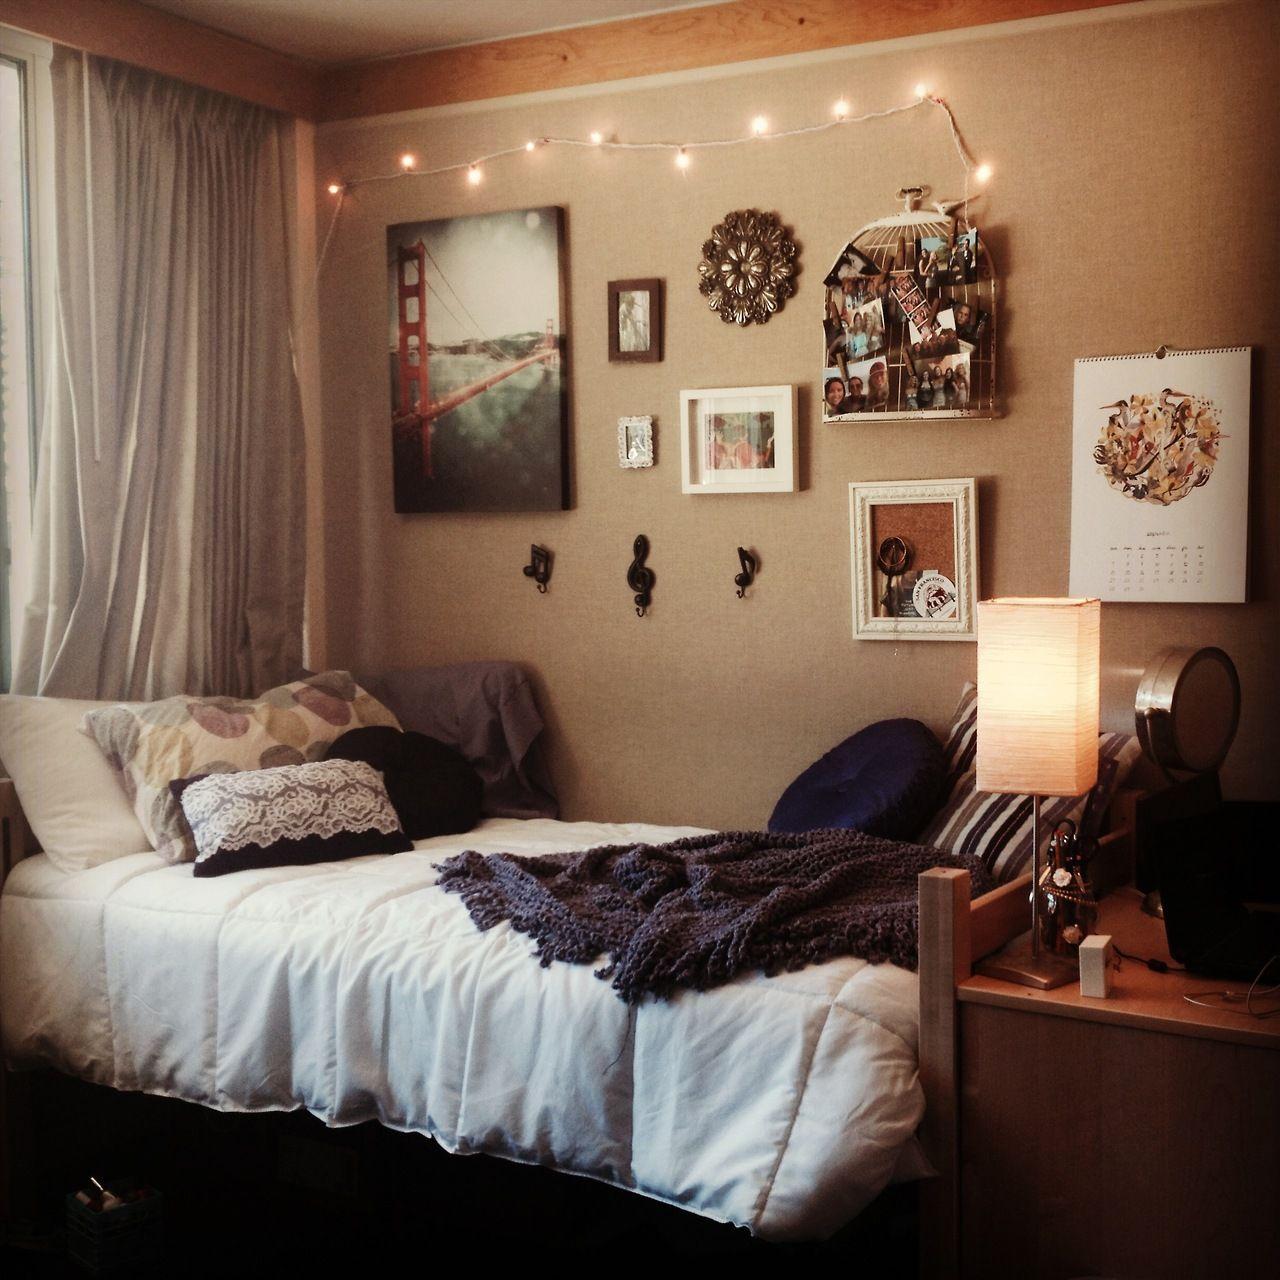 Dorm room from University of California Santa